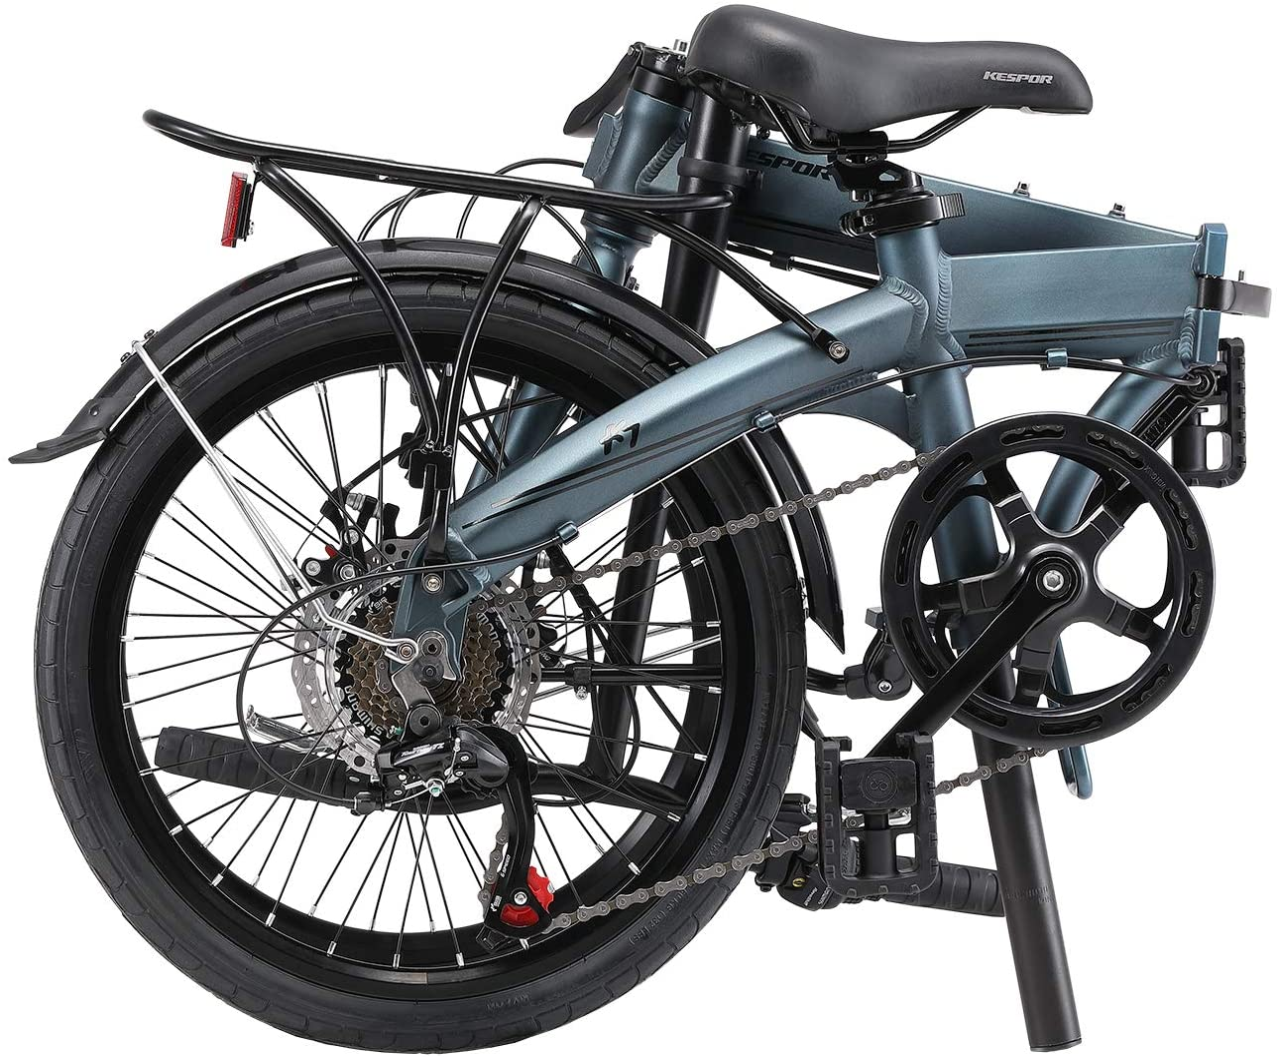 kespor bike folded in